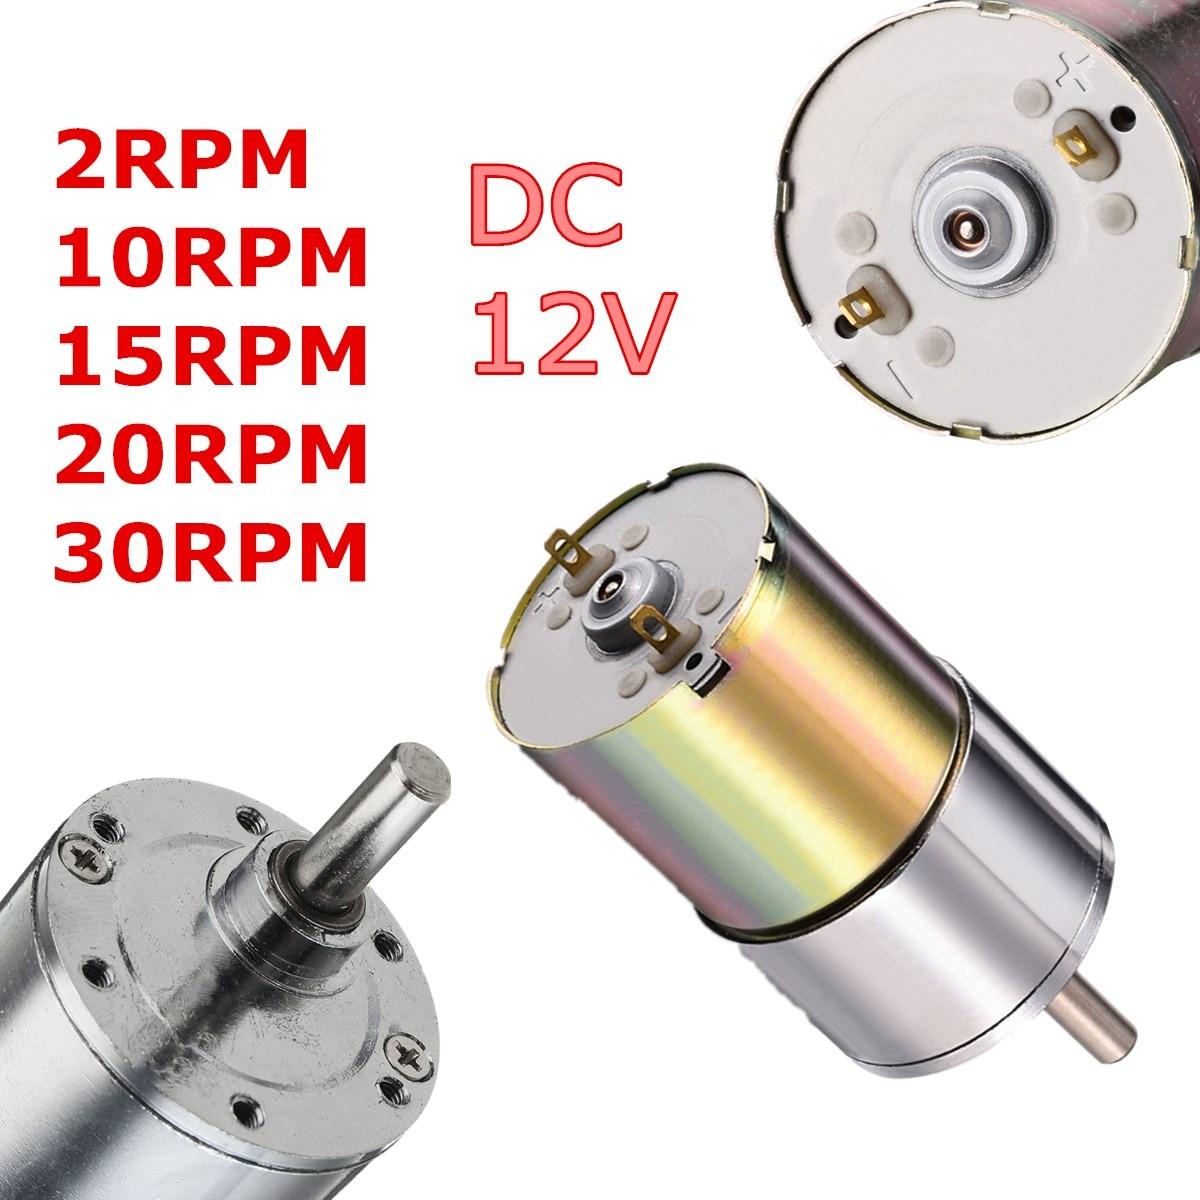 цена на Newest DC 12V 2-1000RPM Powerful High Torque Electric Gear Box Motor Speed Reduction